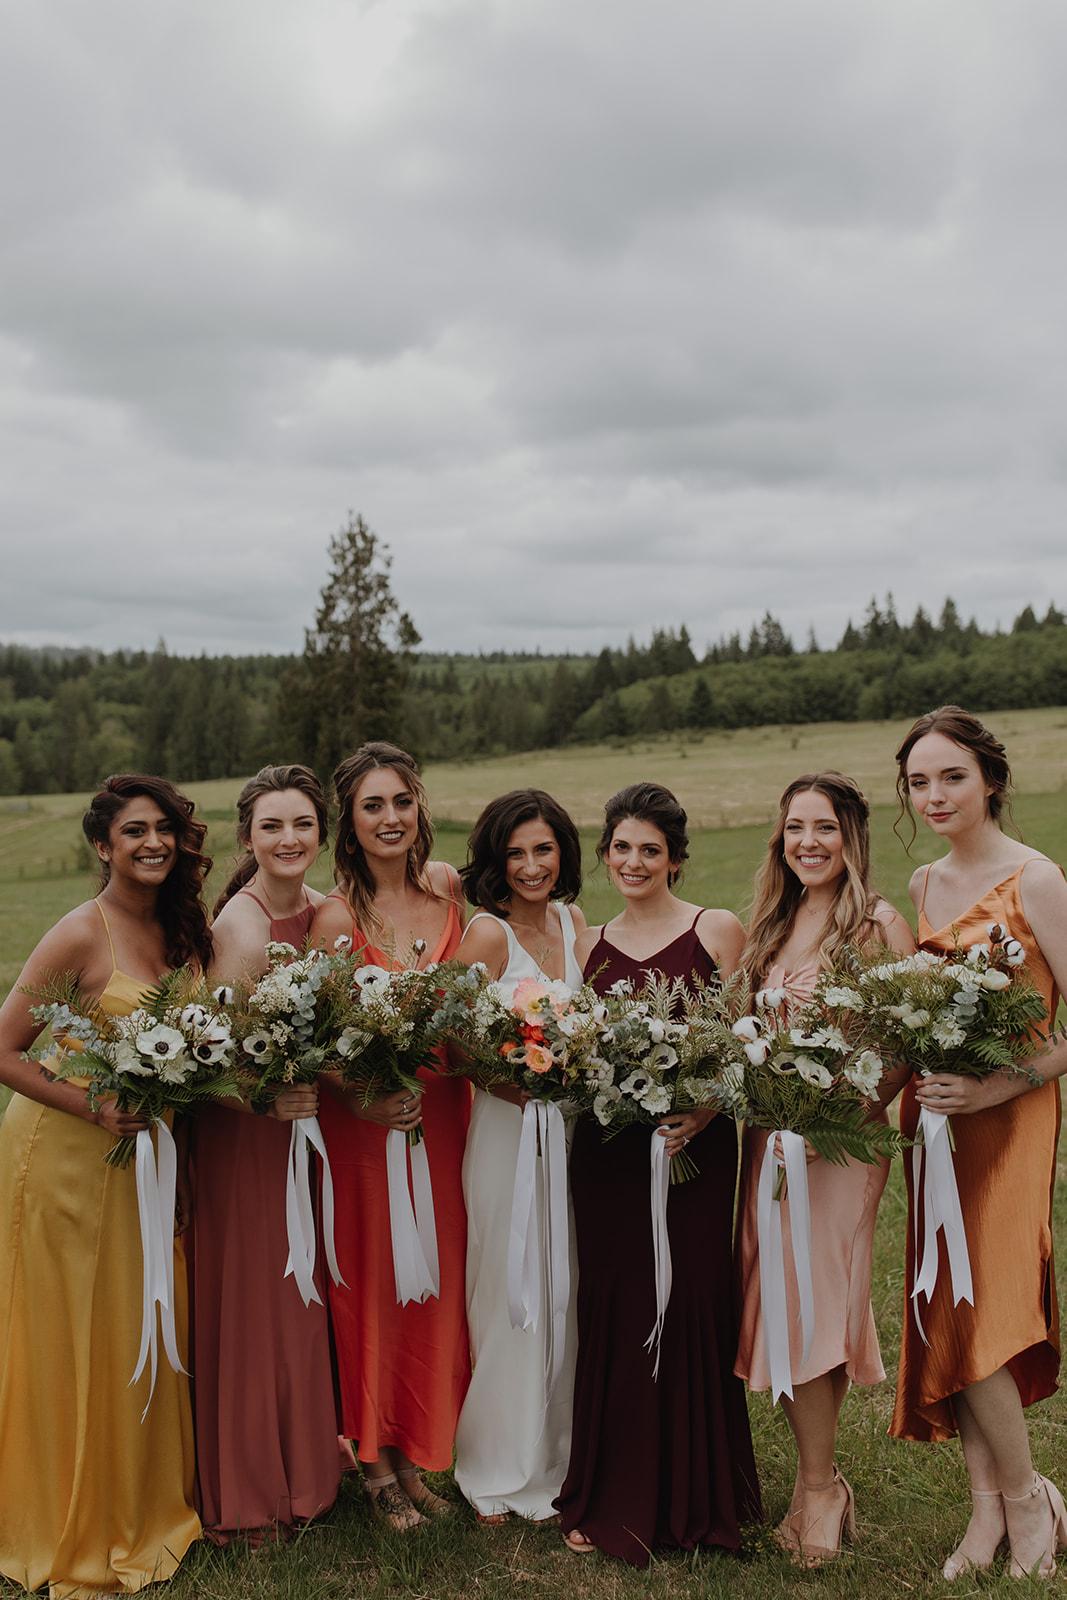 cortney_skye_wedding_june2019-215.jpg